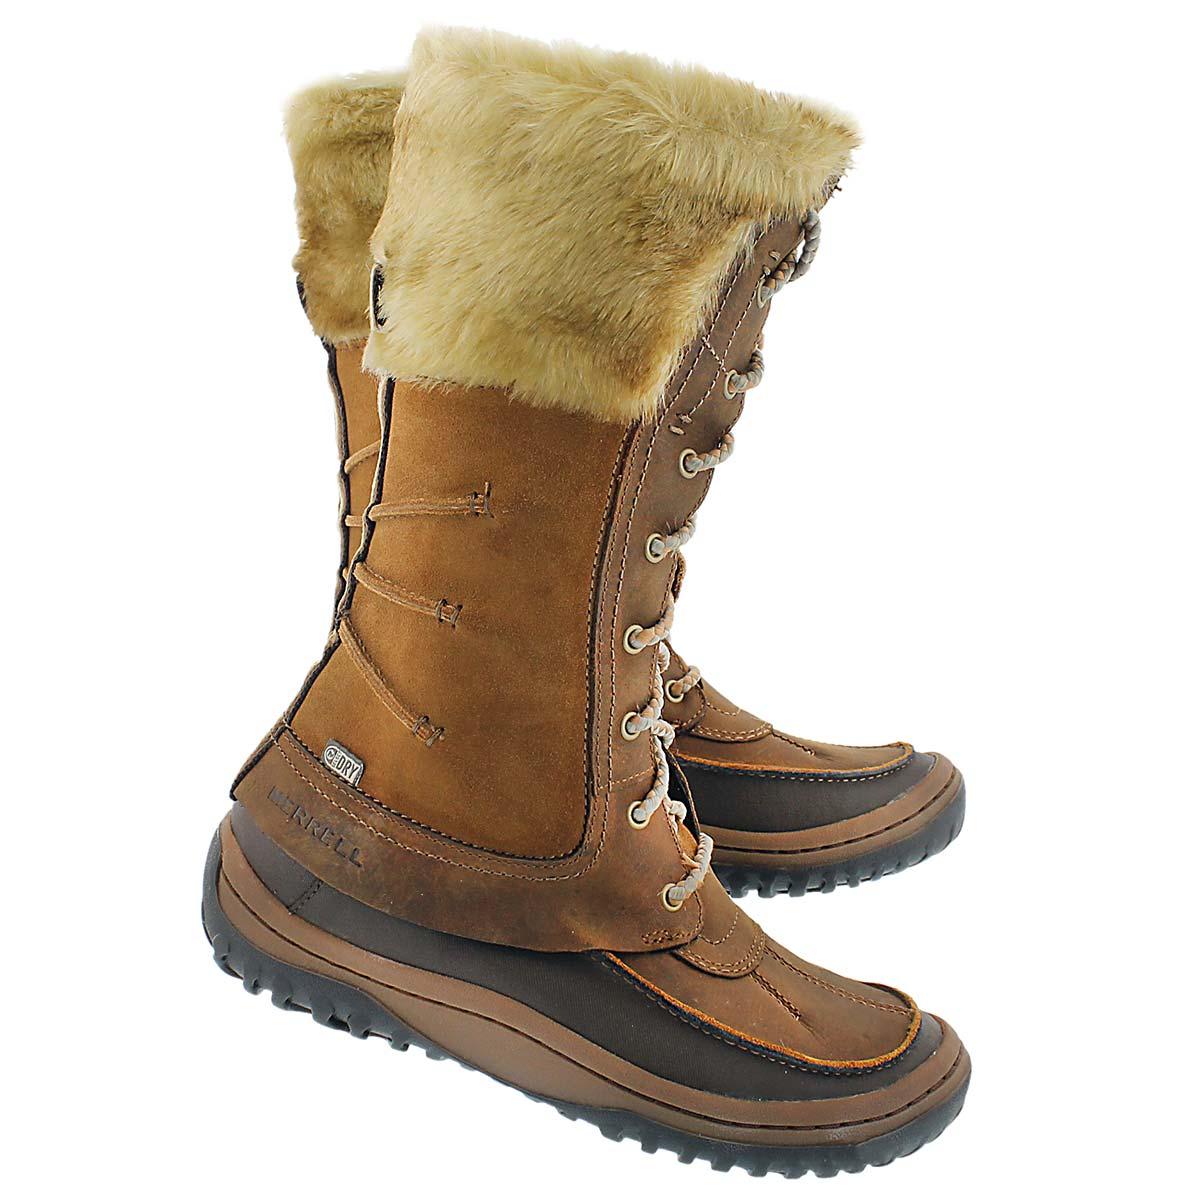 Waterproof Tall Winter Boots Women | Santa Barbara Institute for